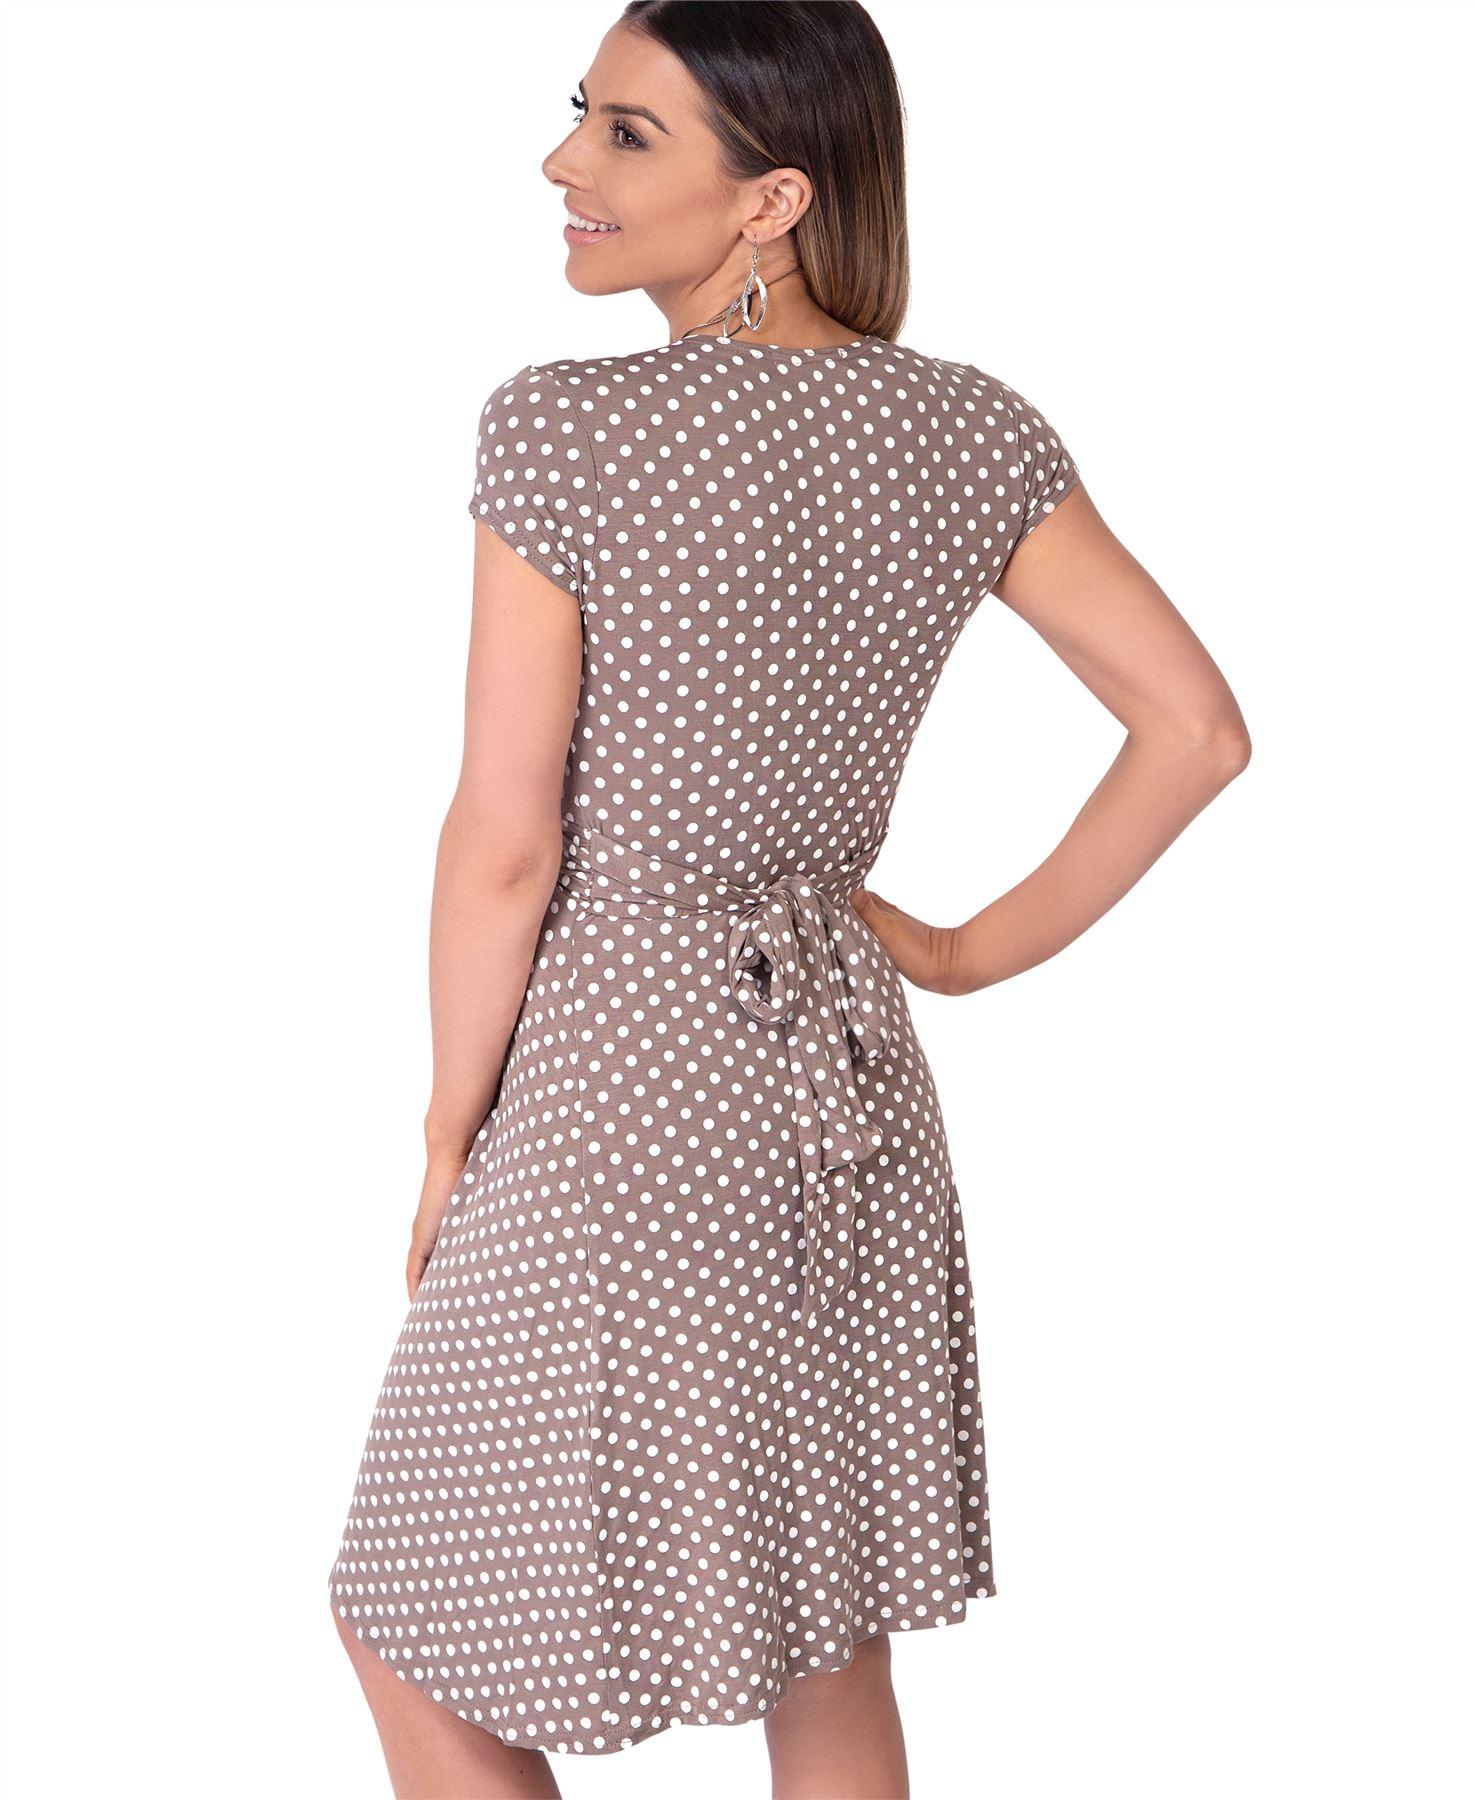 Womens-Polka-Dot-Dress-Pleated-Skirt-Wrap-Front-Mini-V-Neck-Top-Swing thumbnail 22